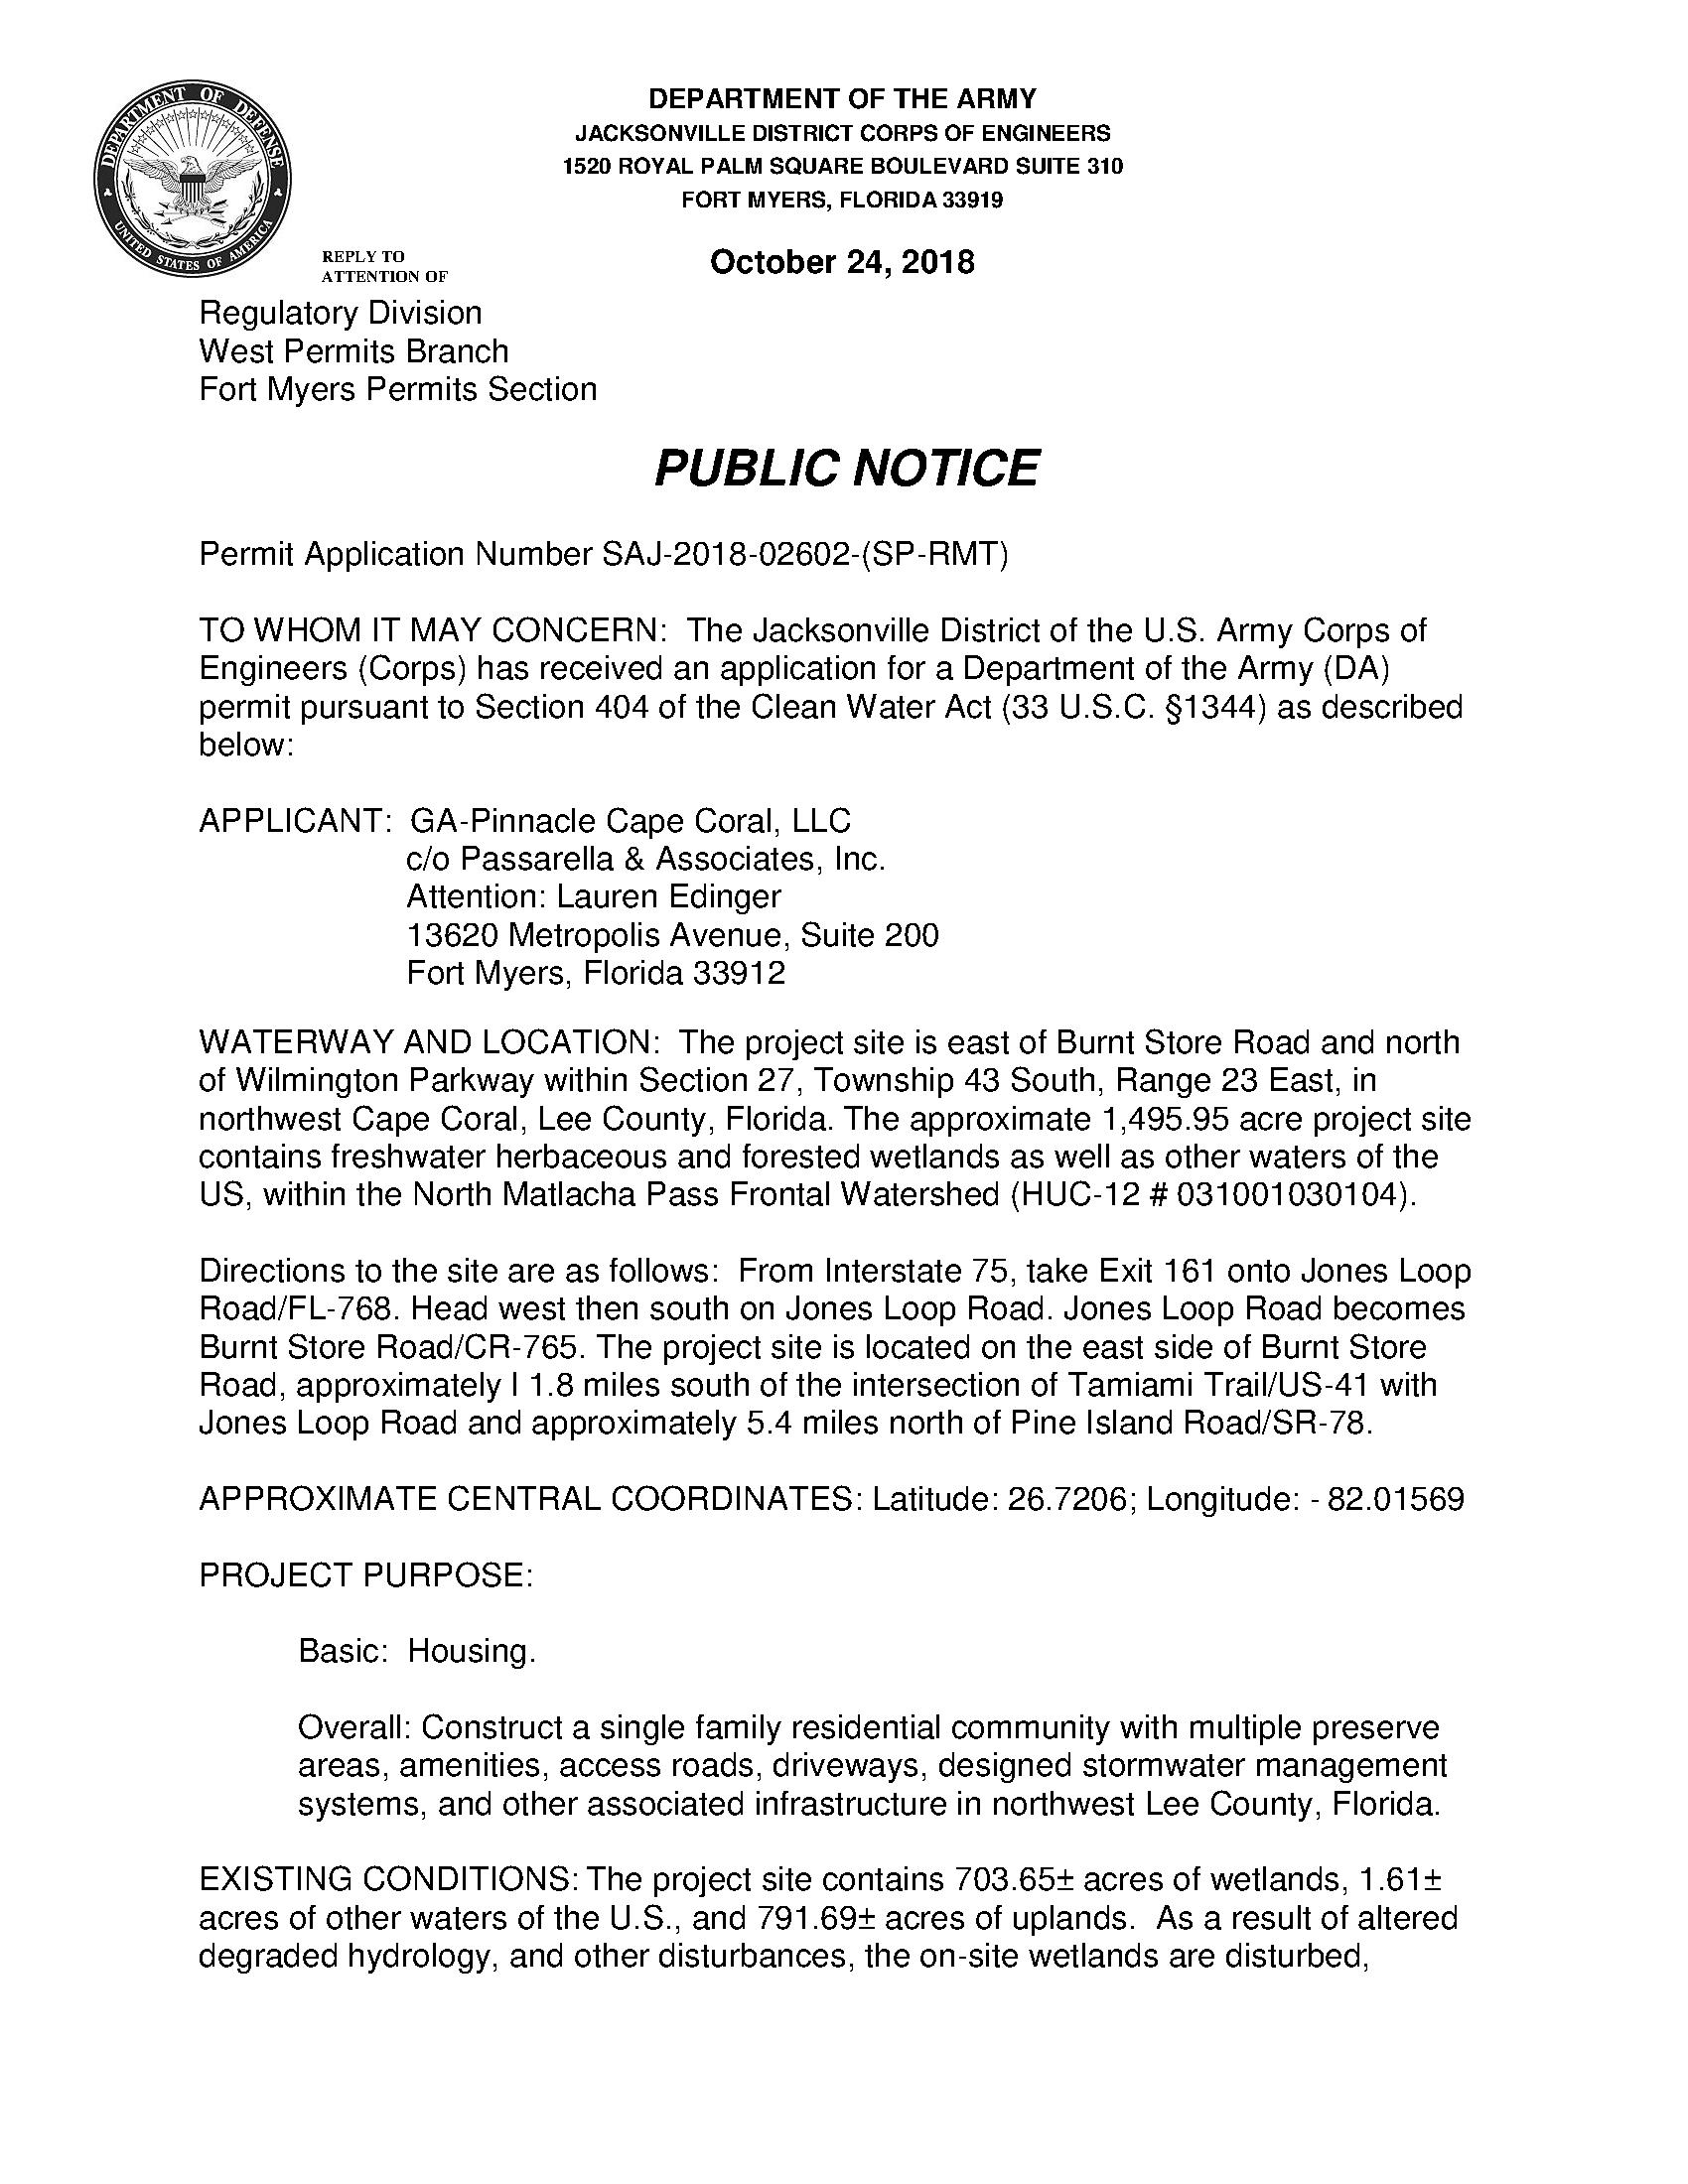 Public notice: Permit application number SAJ-2018-02602-(SP